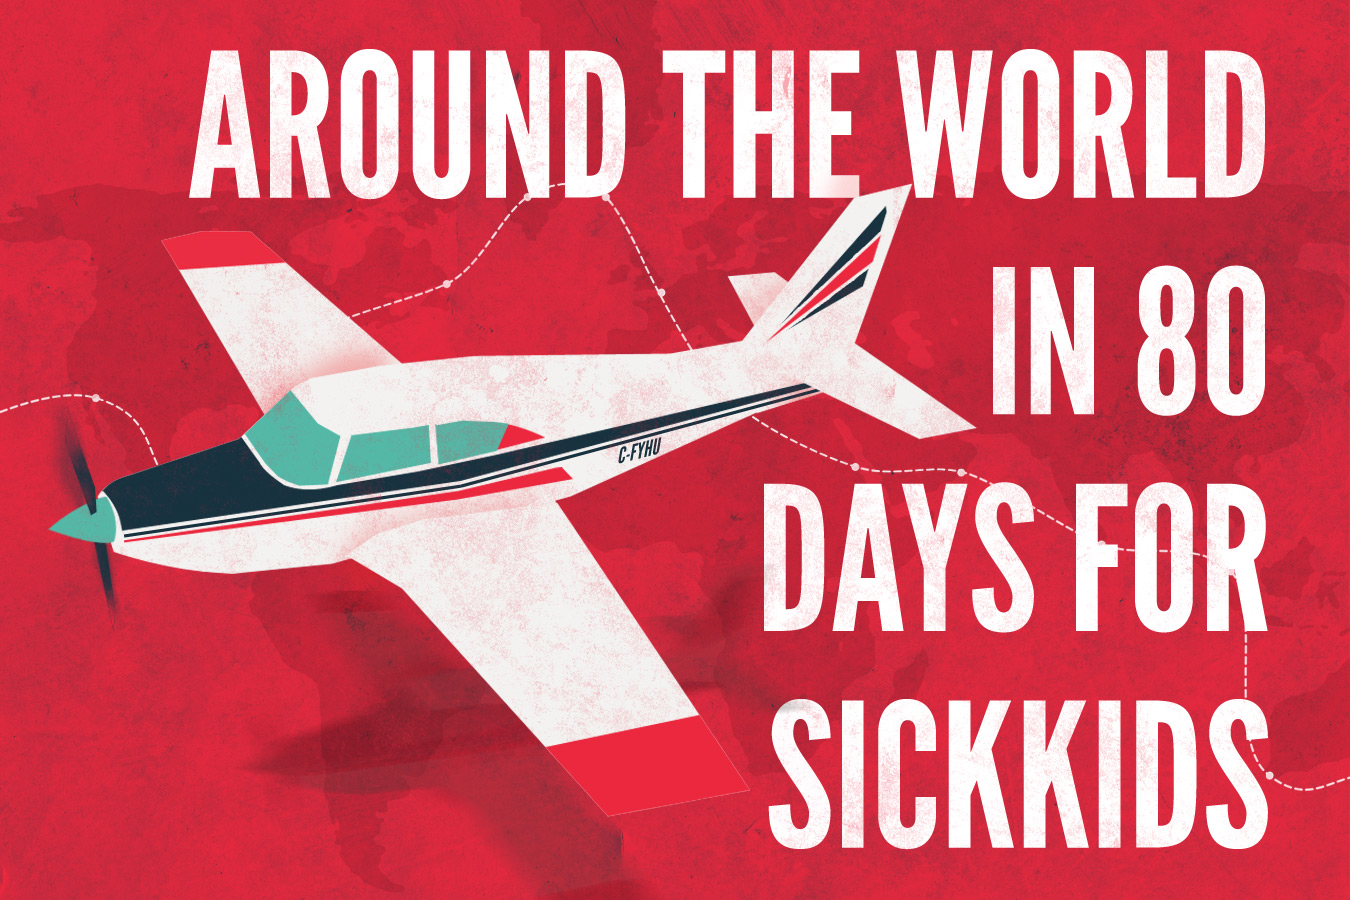 Around the World in 80 Days for SickKids Hospital